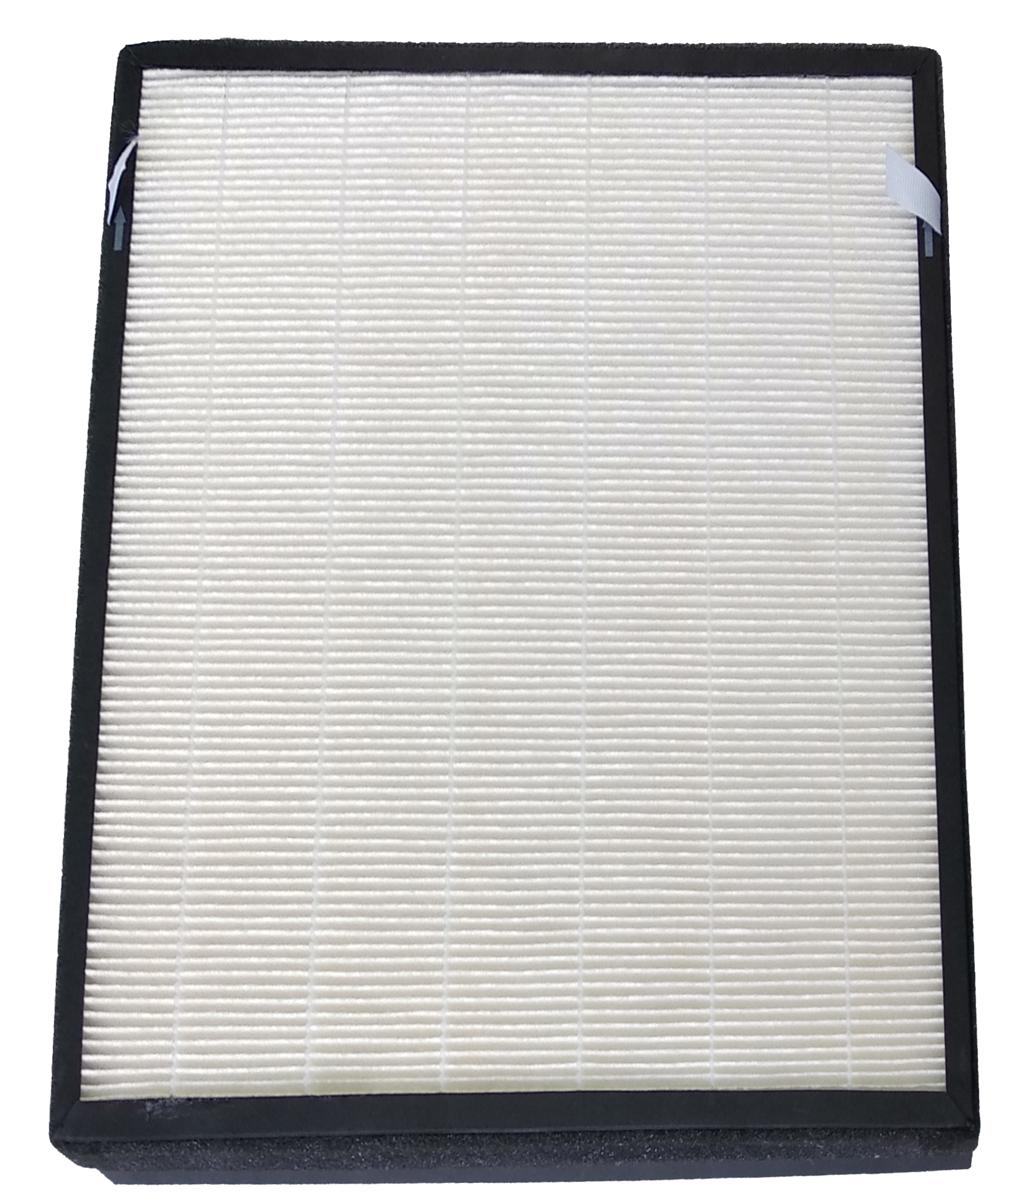 AIC фильтр для очистителя воздуха AIC XJ-4000 цены онлайн